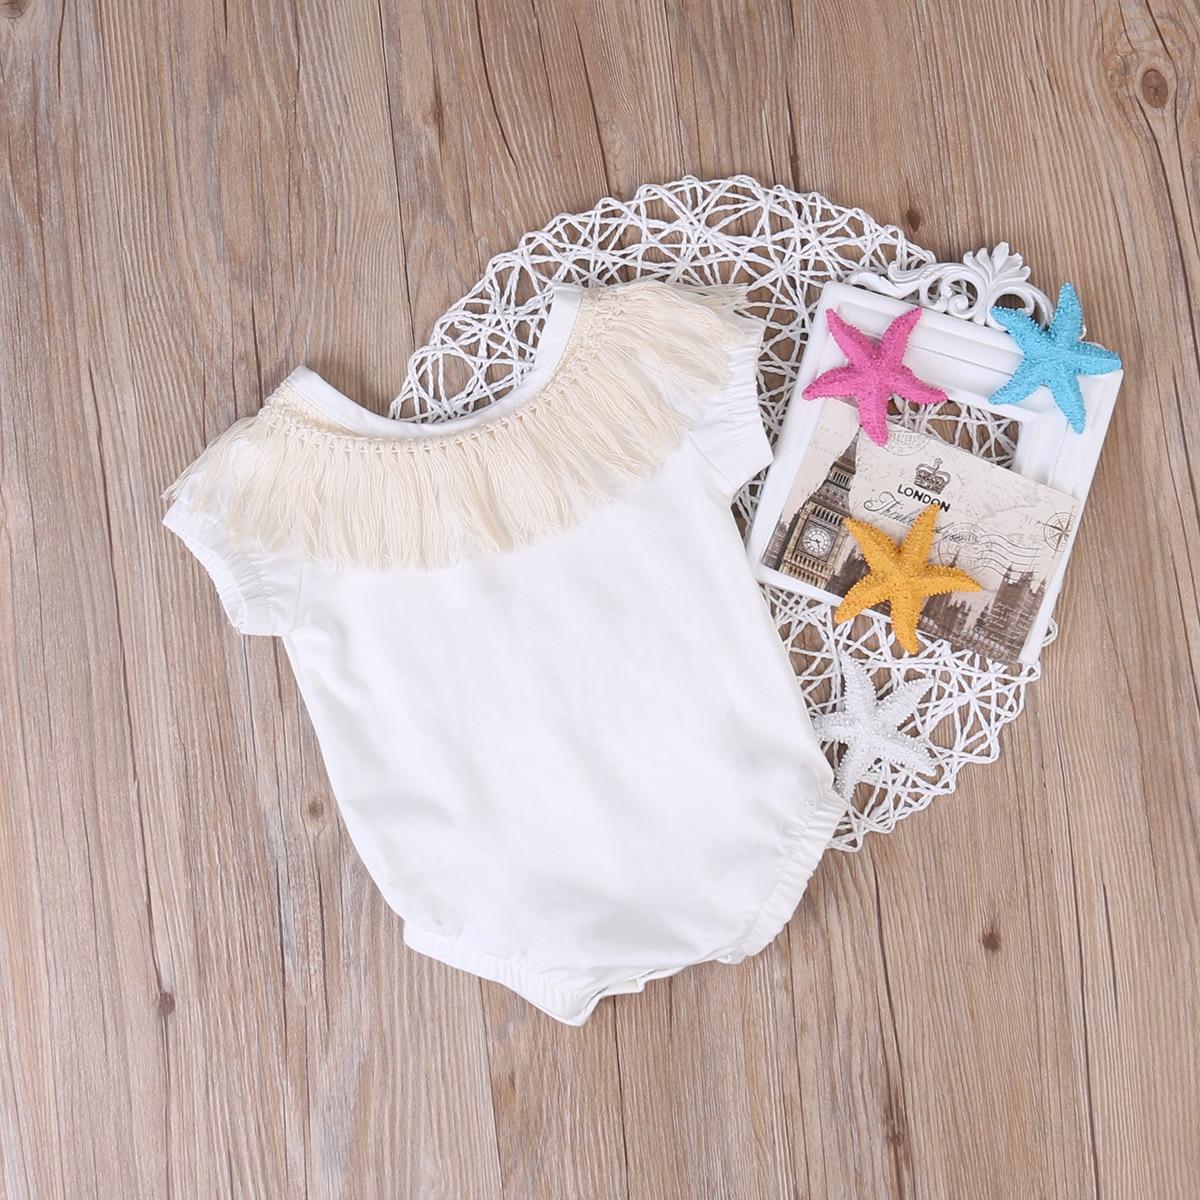 Mono sin mangas con borlas para bebés recién nacidos, ropa de verano para niñas, Mono Blanco de algodón CXD0